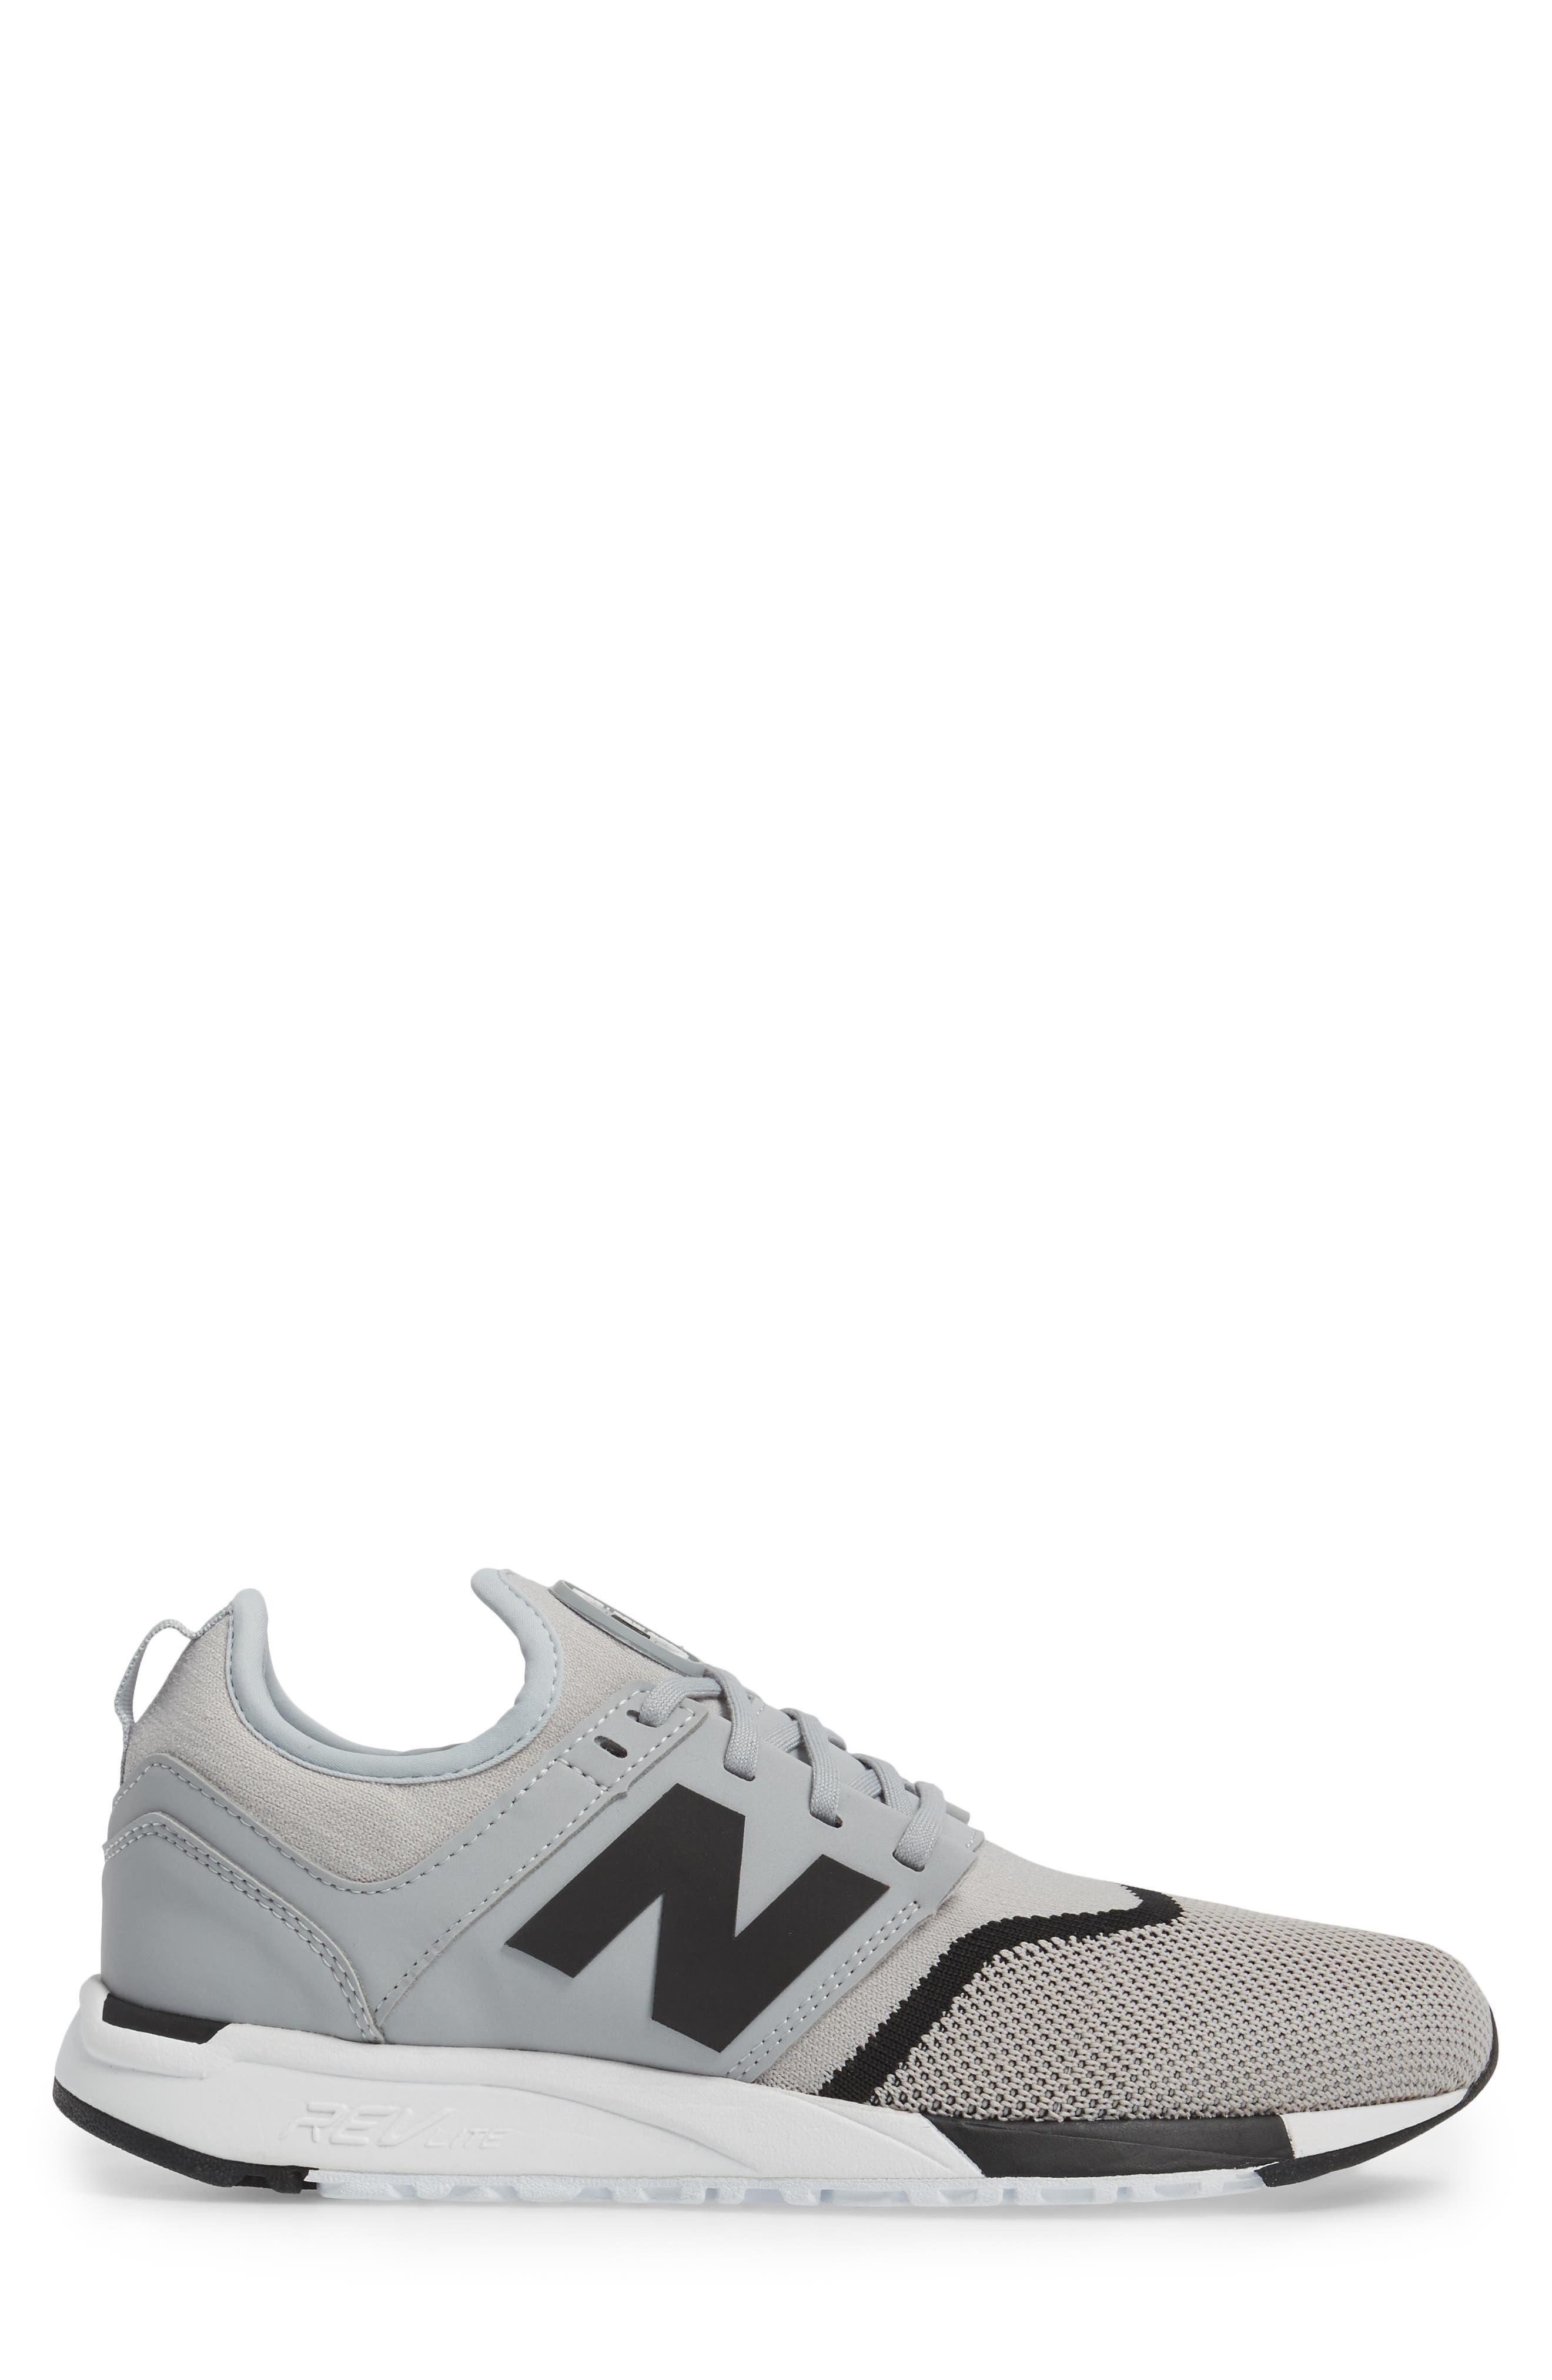 247 Sport Knit Sneaker,                             Alternate thumbnail 3, color,                             030